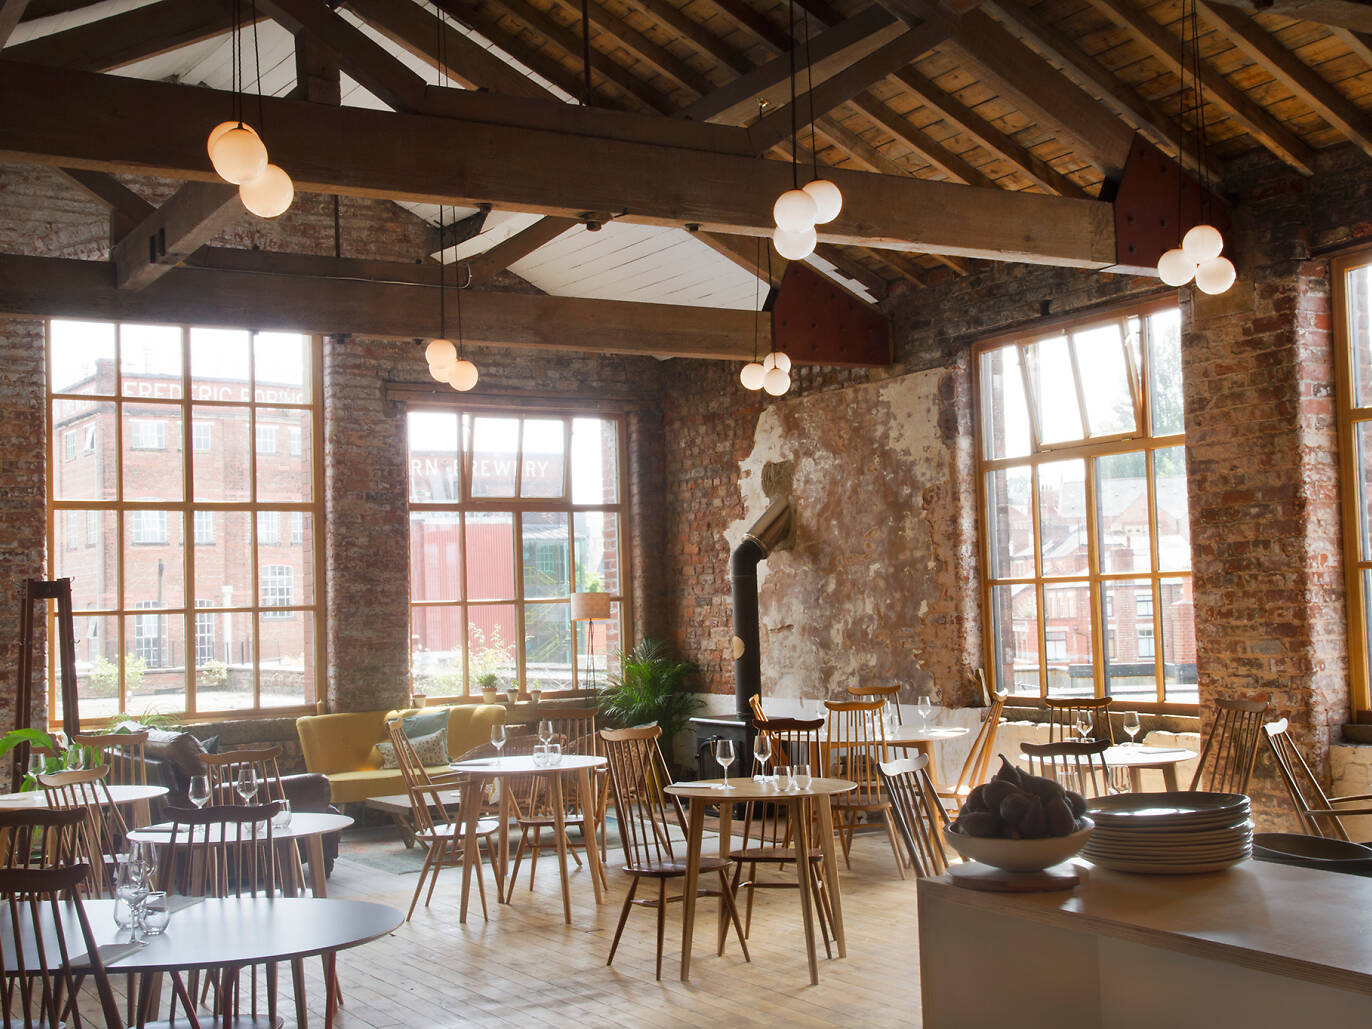 Top 10 Restaurants in Manchester 2020 - Foodporn Blog - by ...